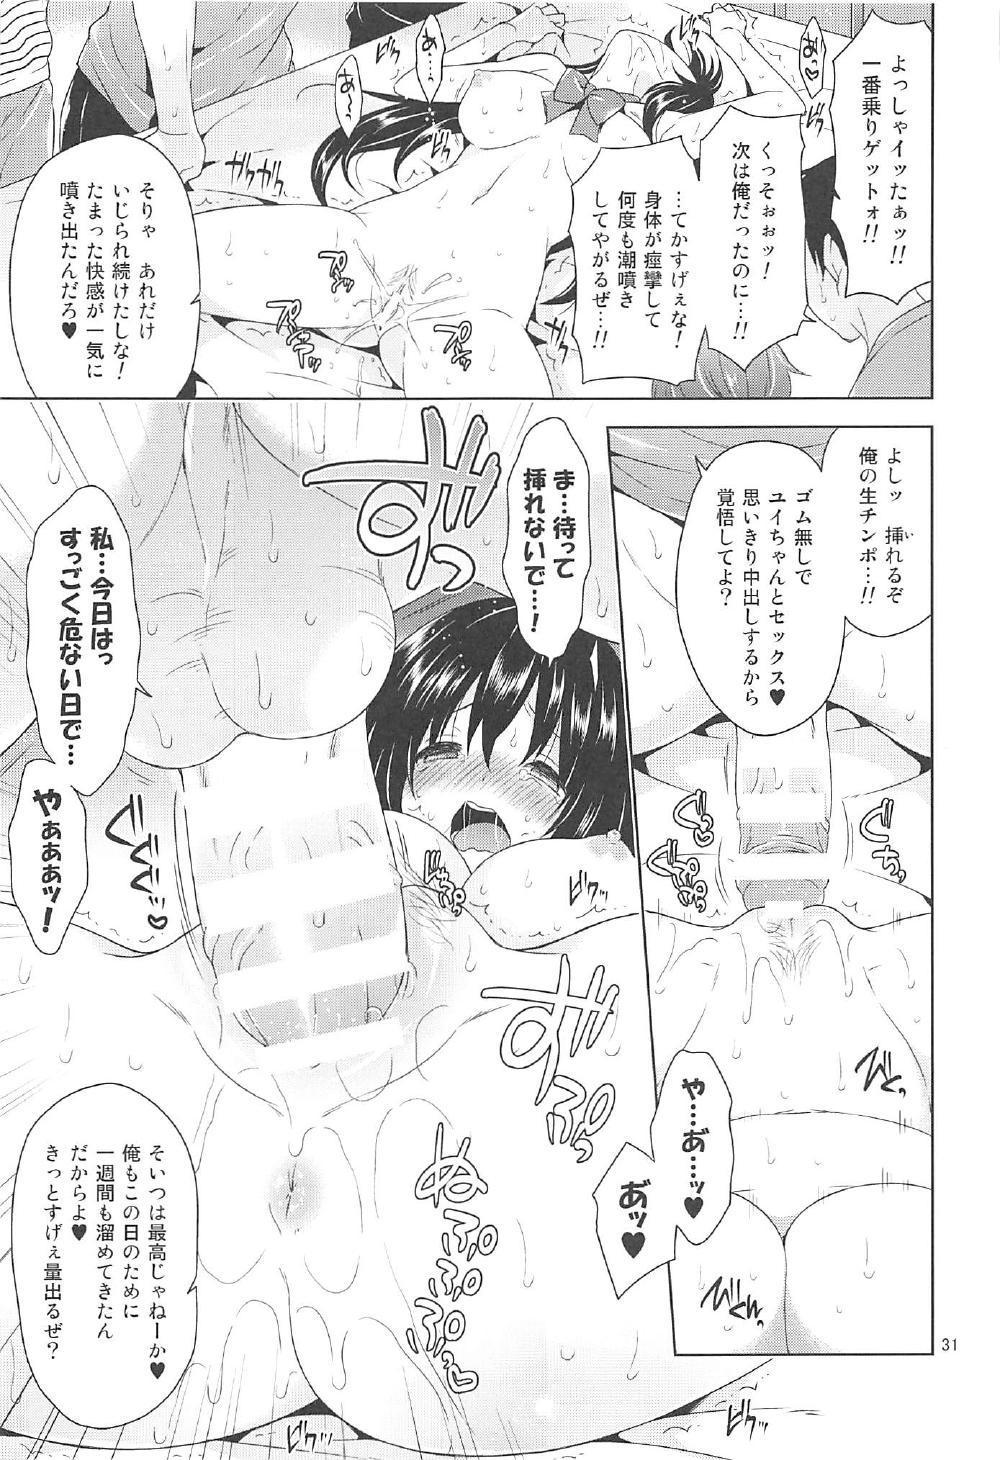 Sairoku March Trouble 3 29